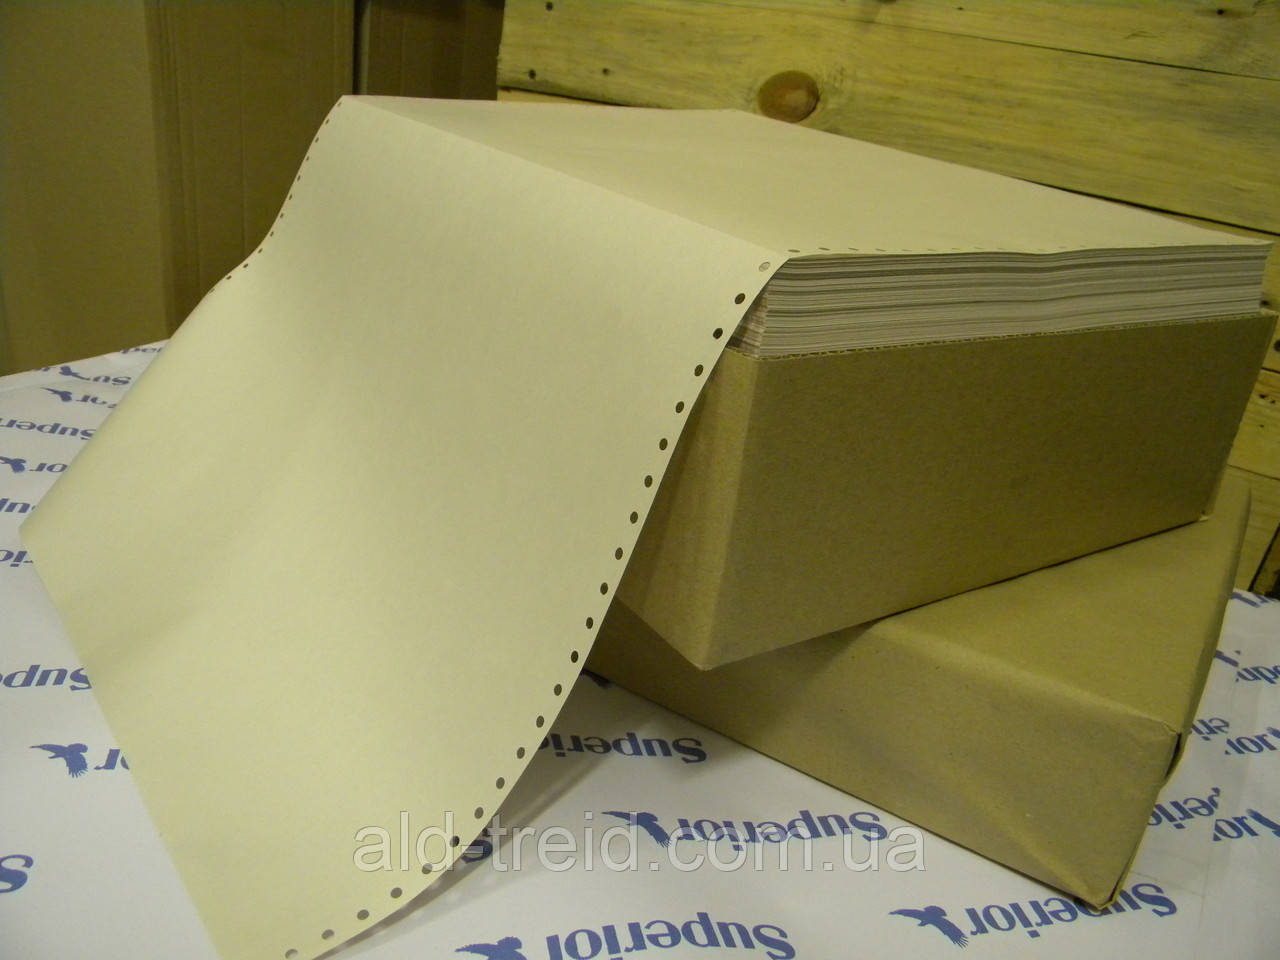 Перфорированная бумага ЛПФ 45г/м2-210 Eco-D *при заказе от 2500грн.